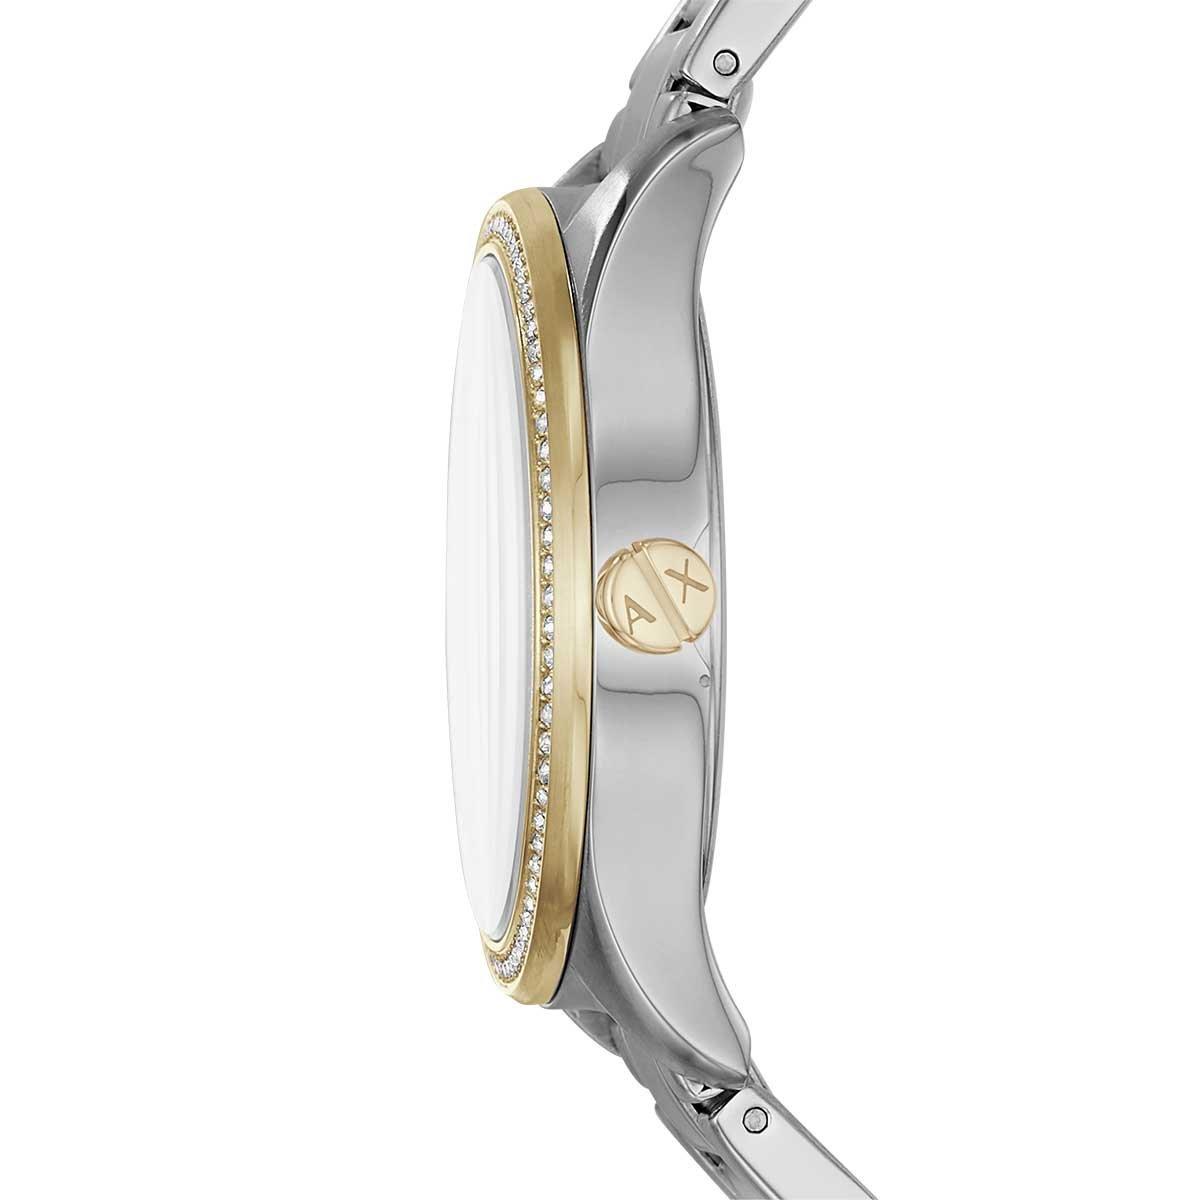 Reloj Dama Armani Exchange Ax4321 ee5ecccfaab7